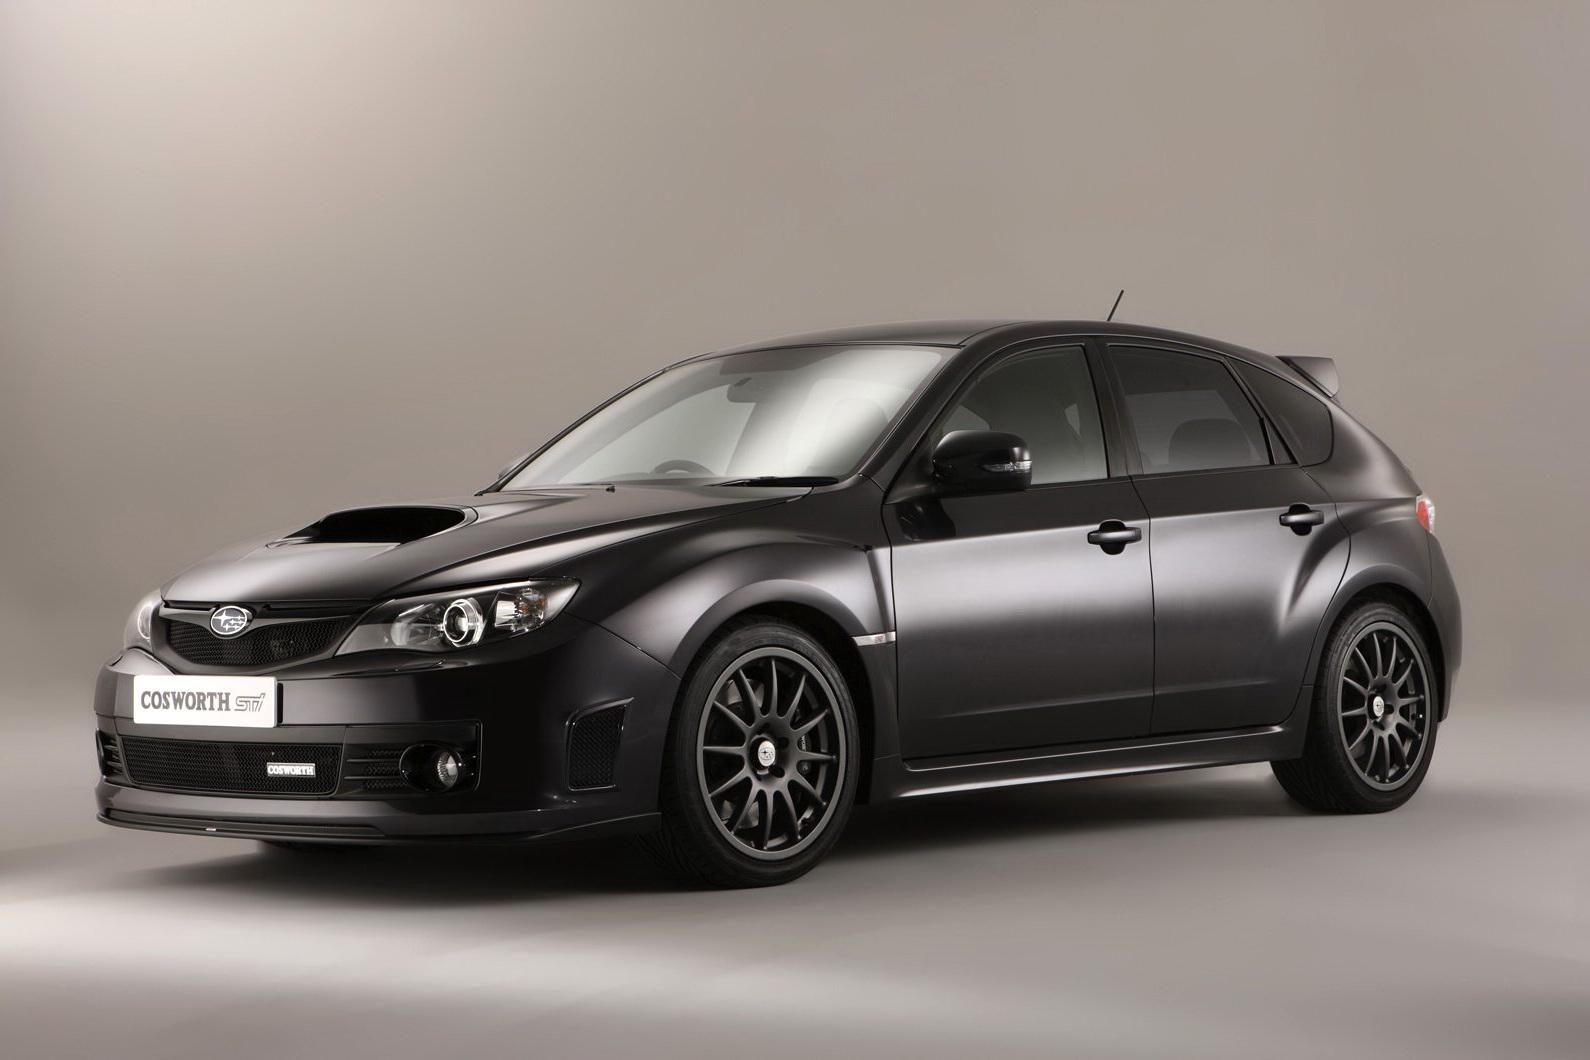 Subaru Cosworth Impreza Sti Cs400 Official Photos Of